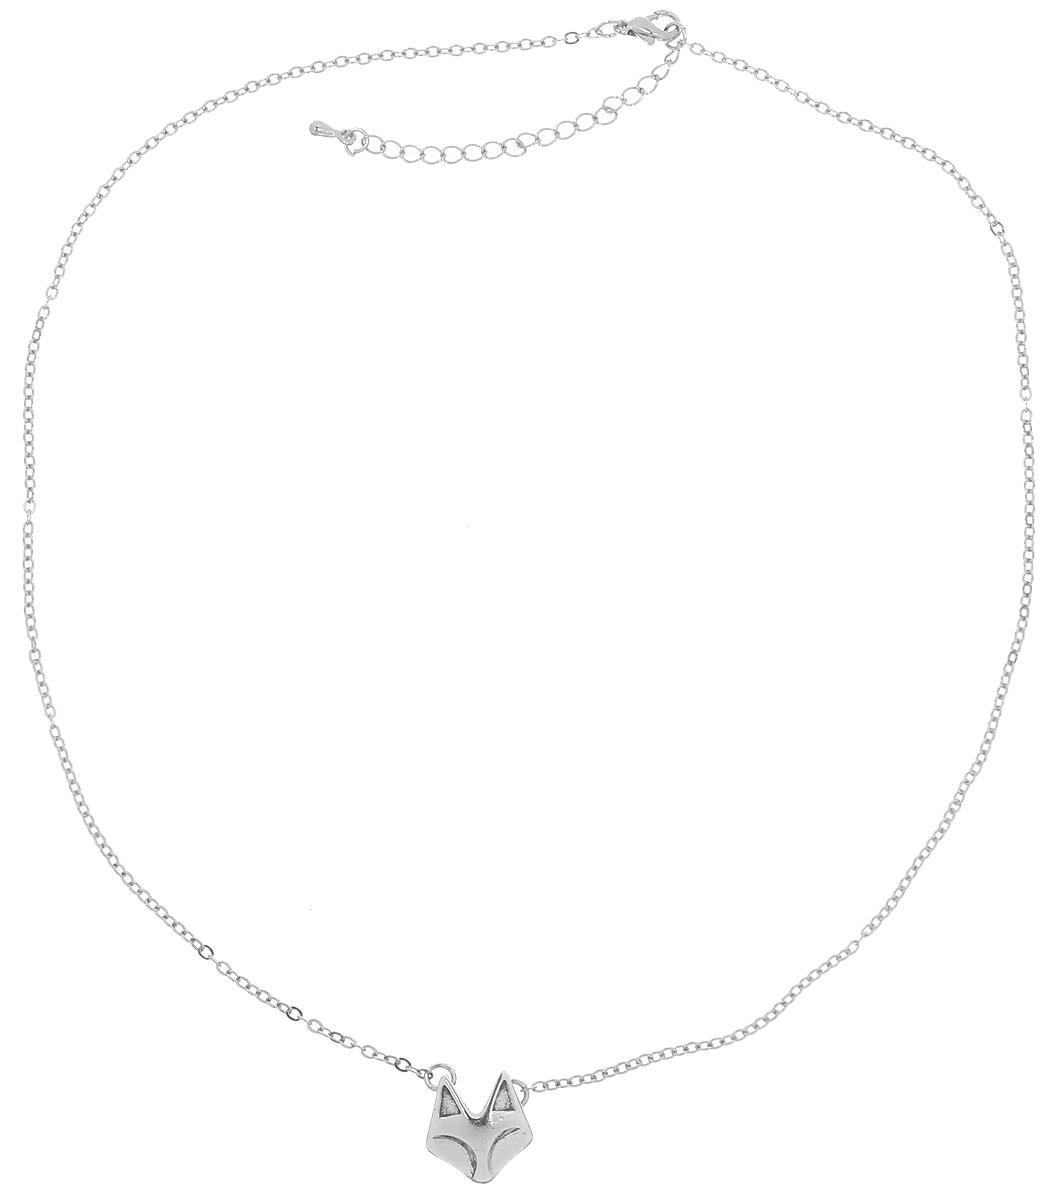 Jenavi, Коллекция Young 2, Фунгера (Кулон), цвет - серебро